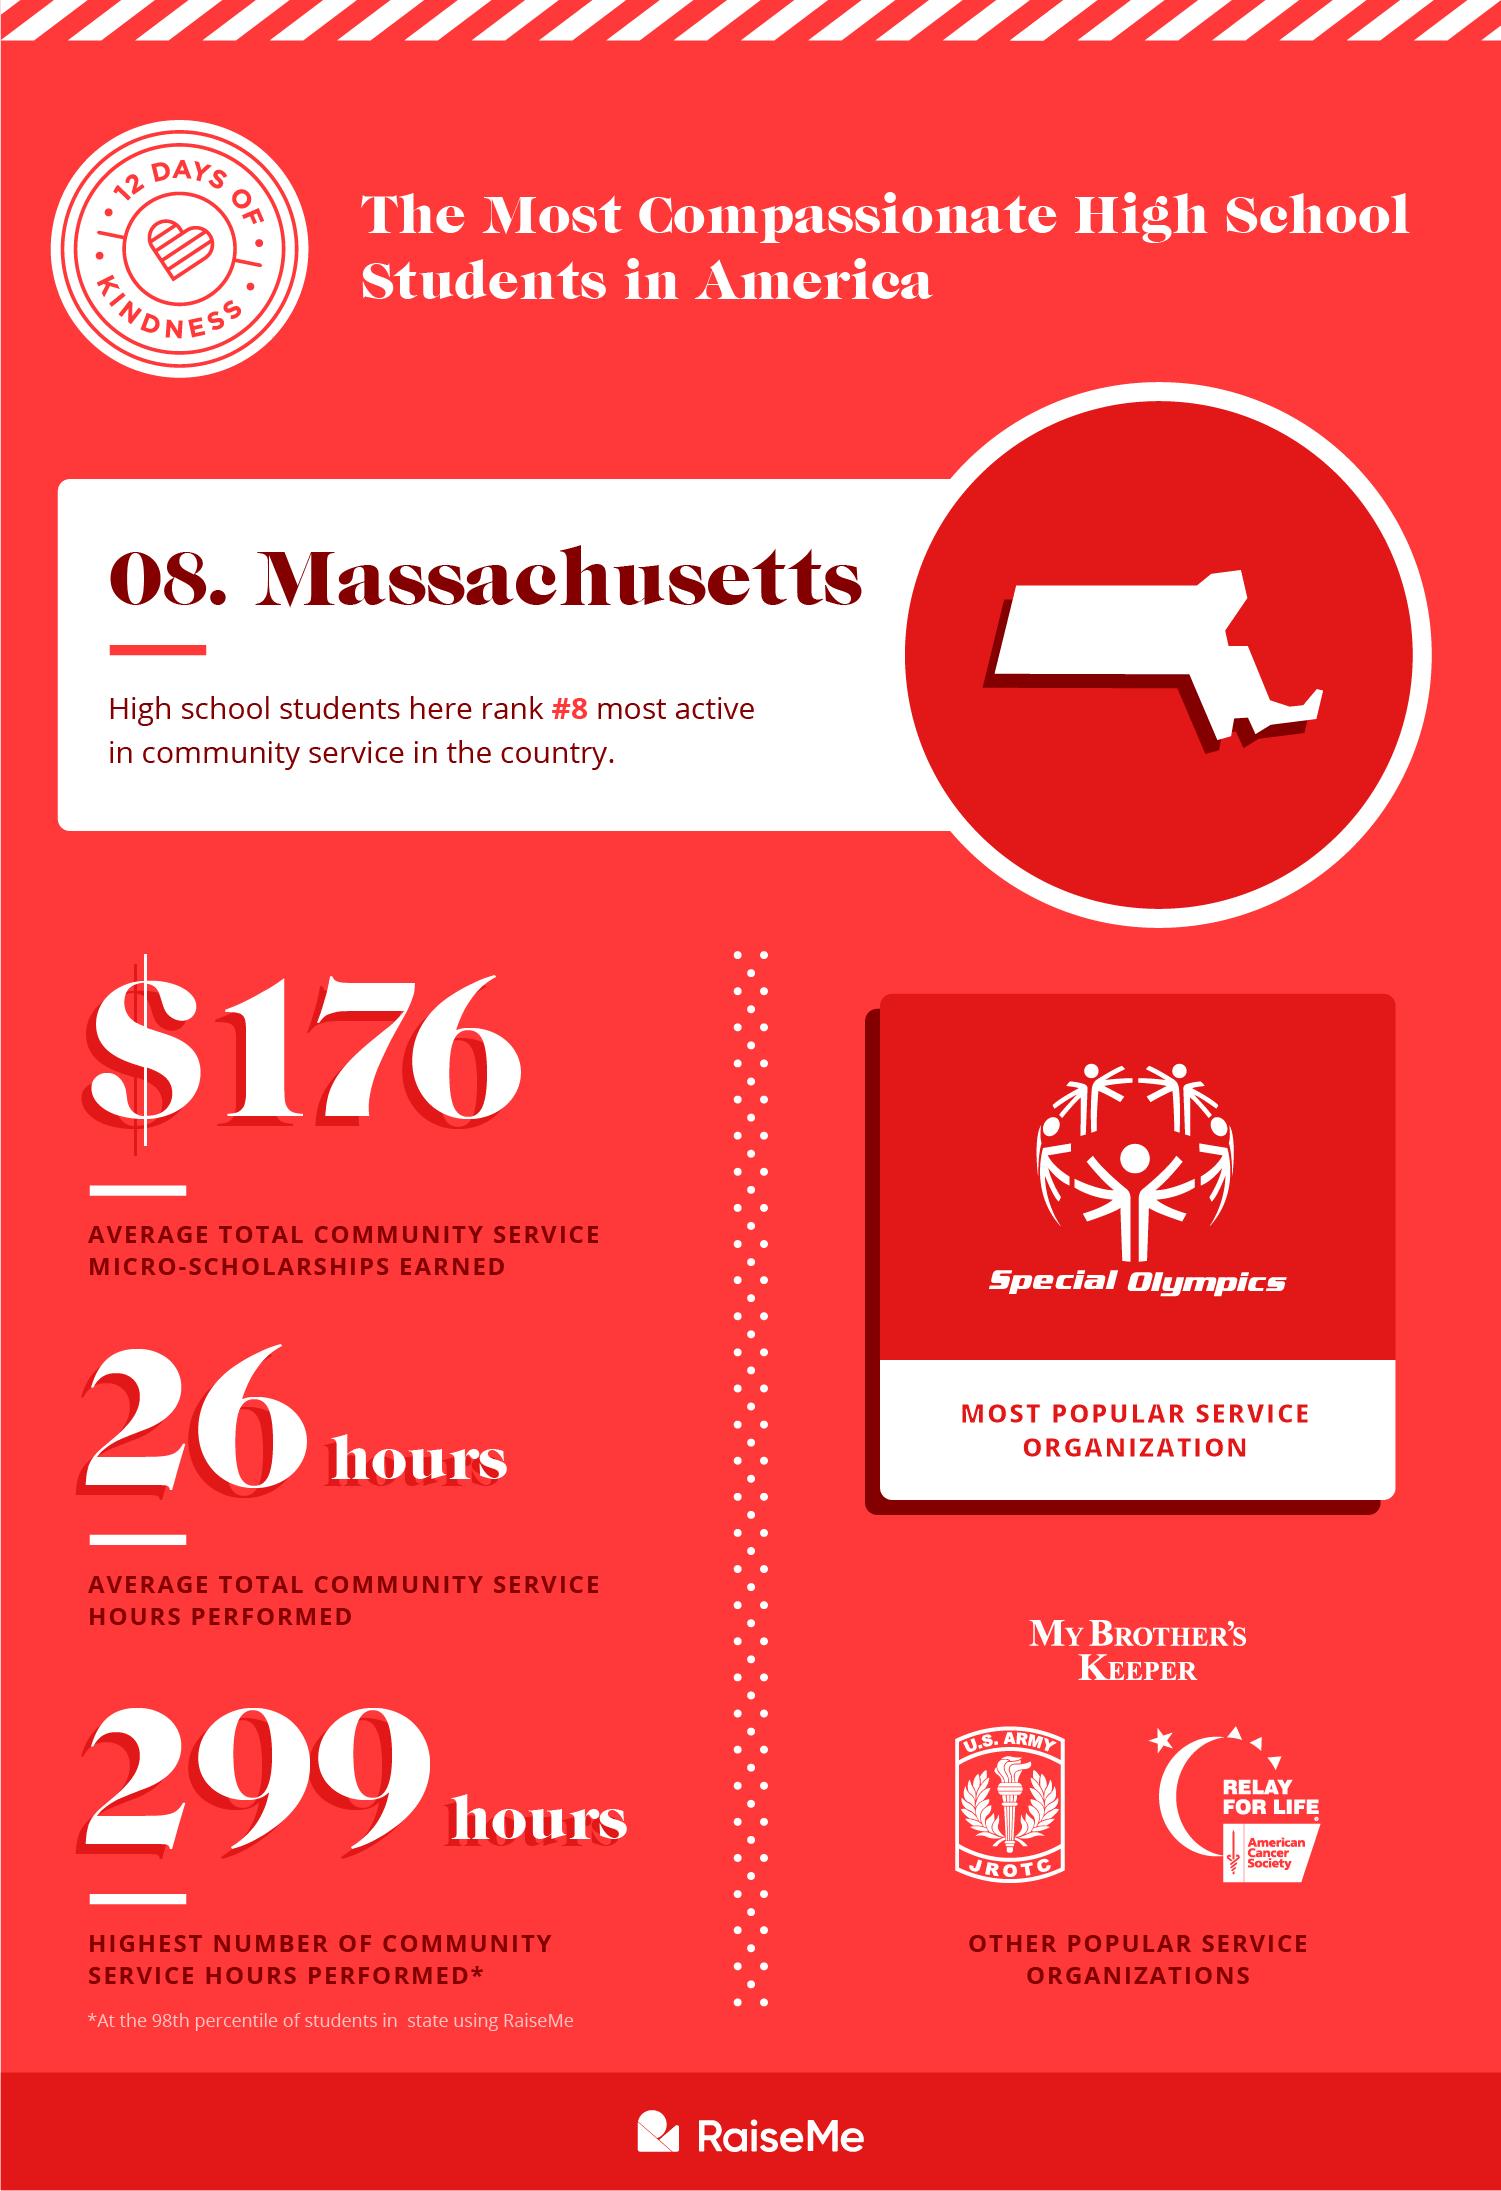 #8 Massachusetts